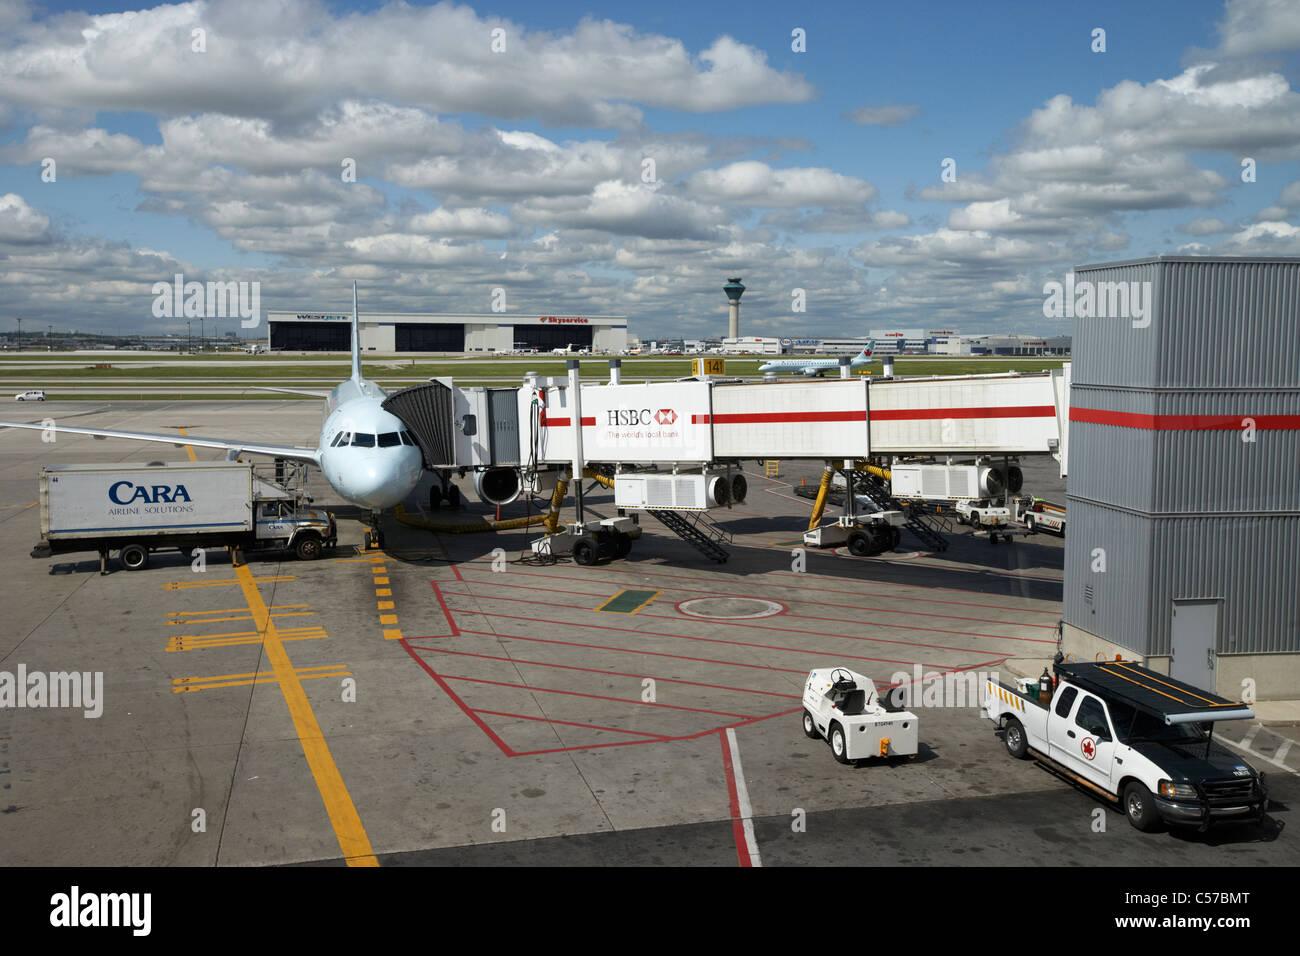 air canada aircraft and airport vehicles Toronto Pearson International Airport Ontario Canada - Stock Image